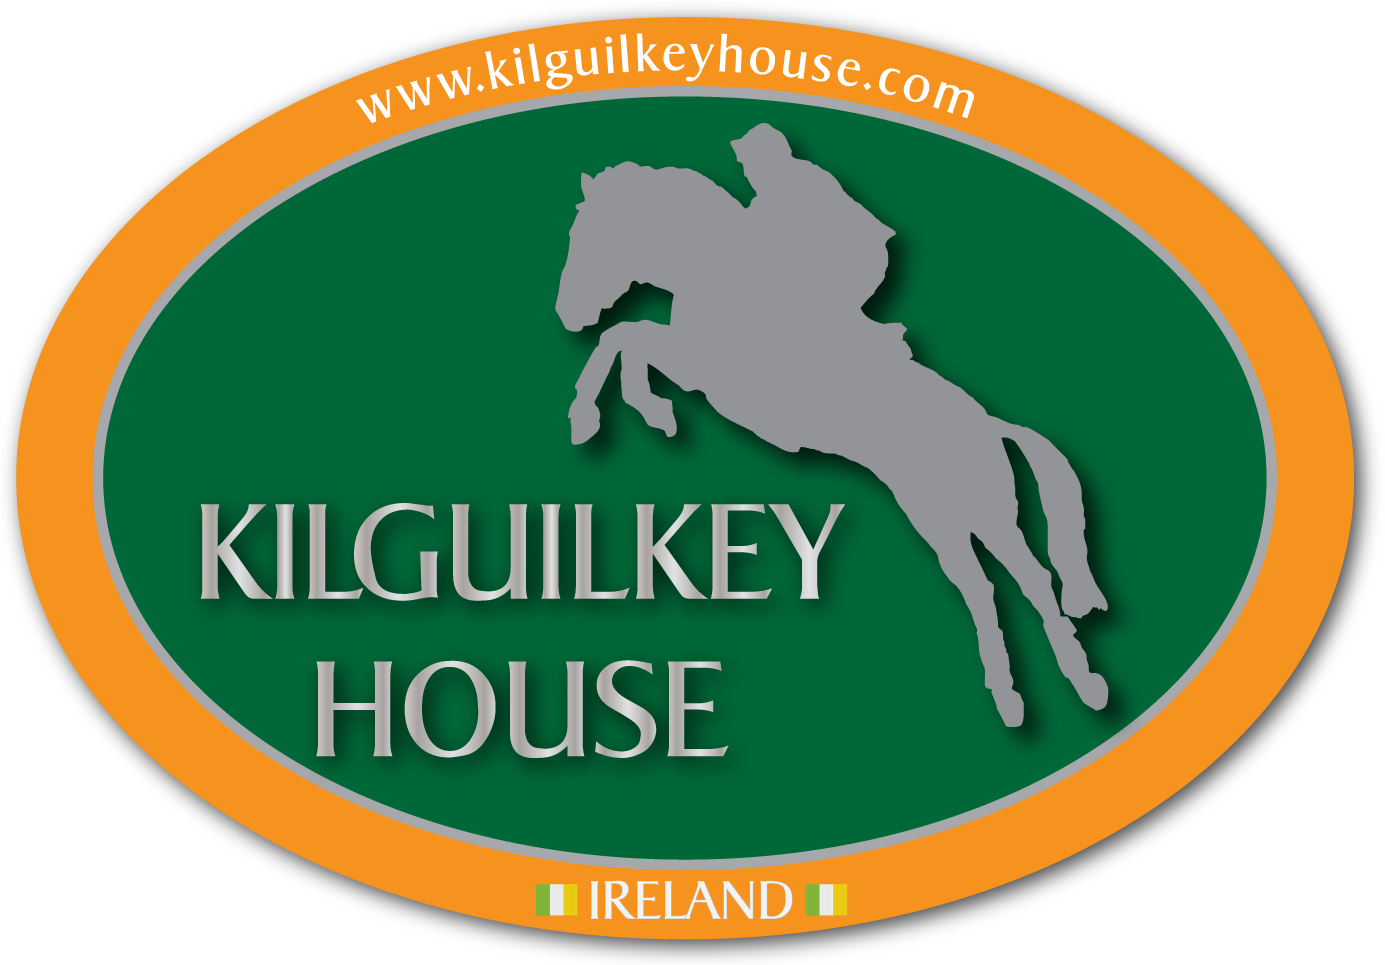 Kilguilkey House